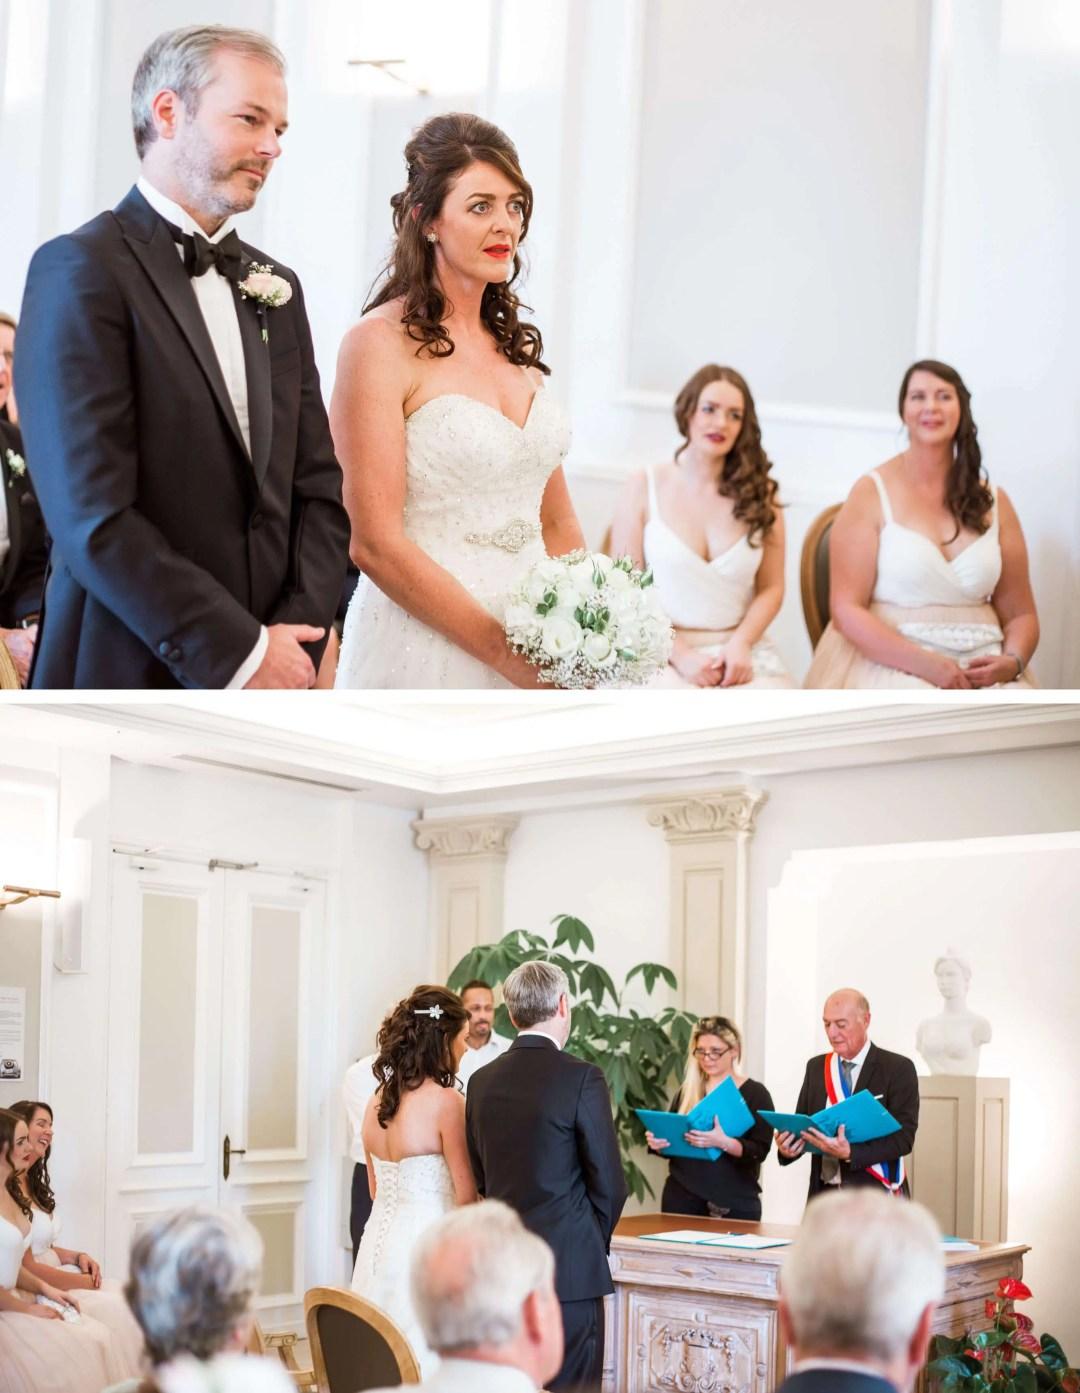 la-mairie-town-hall-ceremony-destination-wedding-photographer